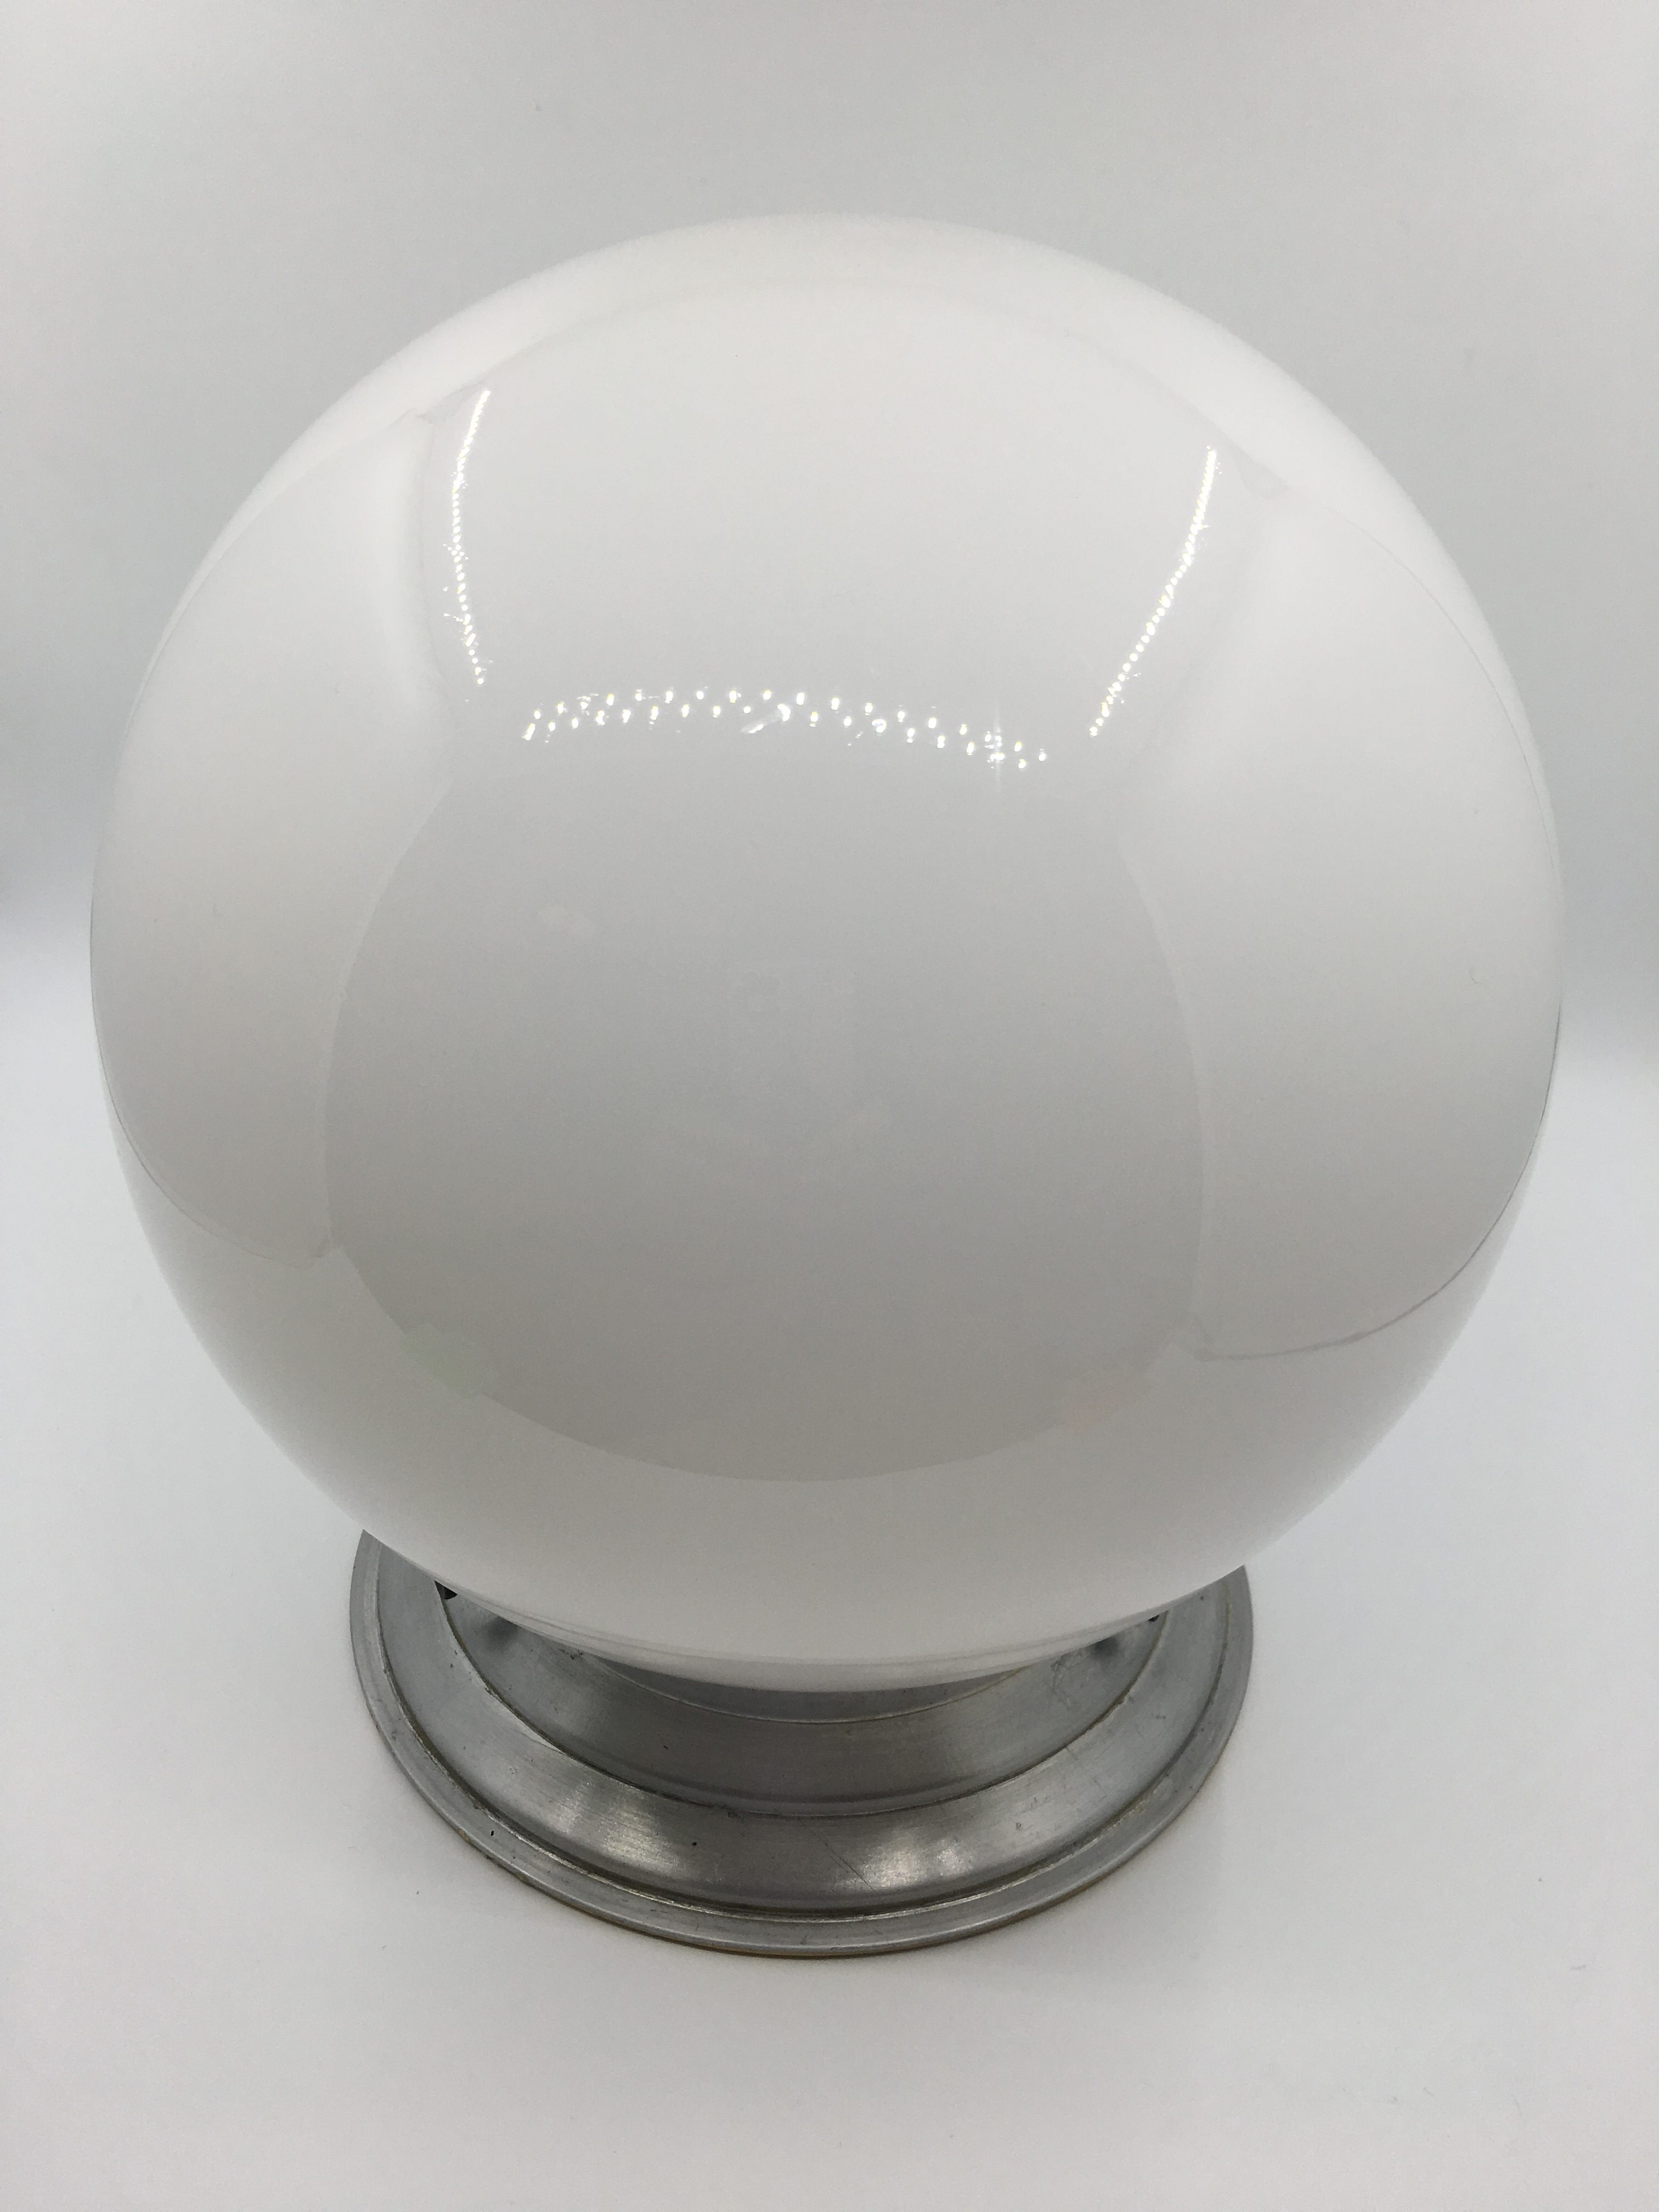 lampe plafonnier boule verre opalin art deco brocnshop. Black Bedroom Furniture Sets. Home Design Ideas